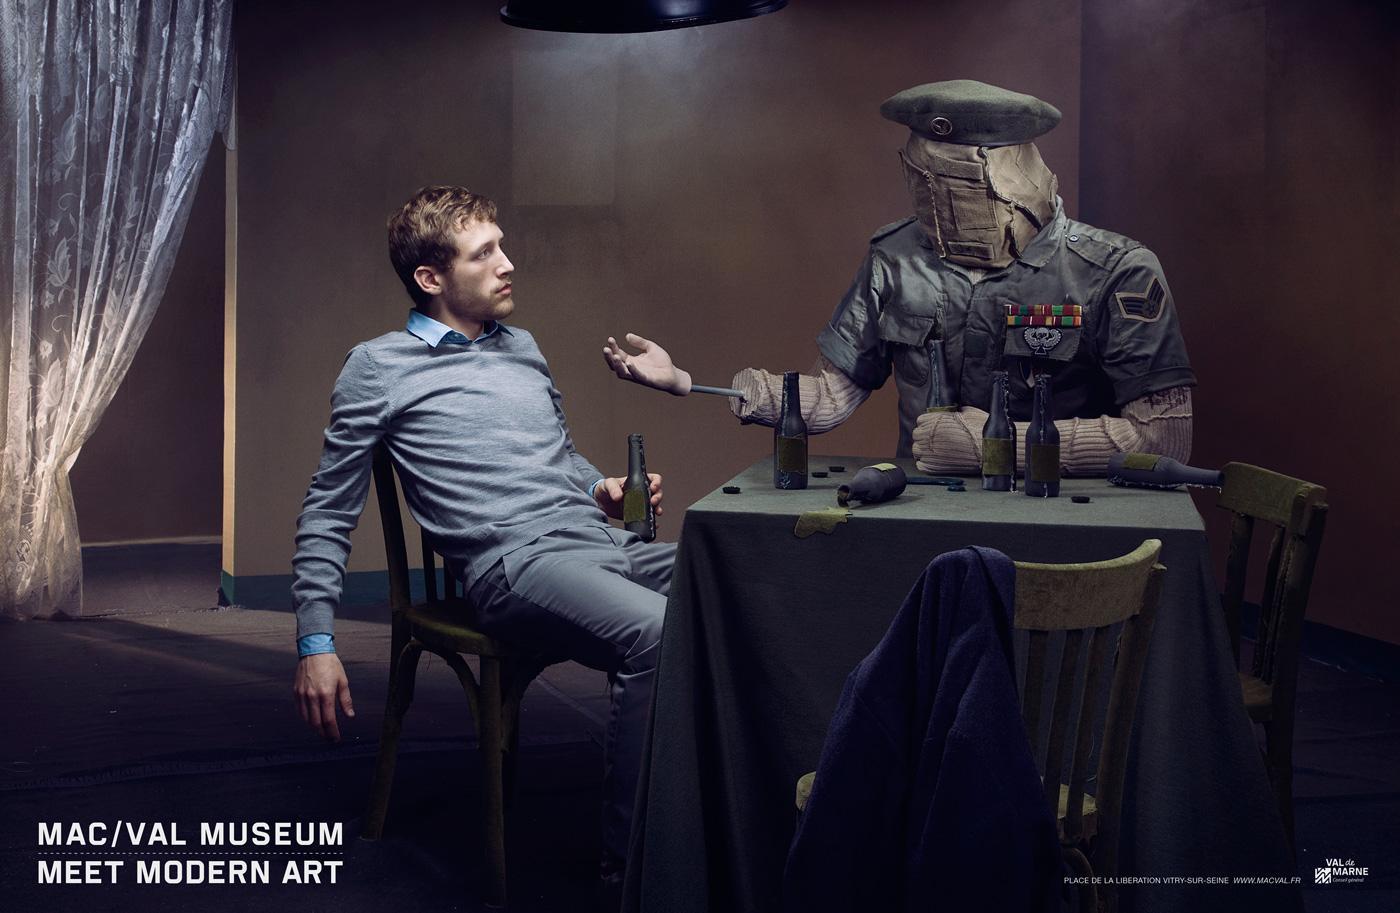 Val-de-Marne Museum Print Ad -  The encounter